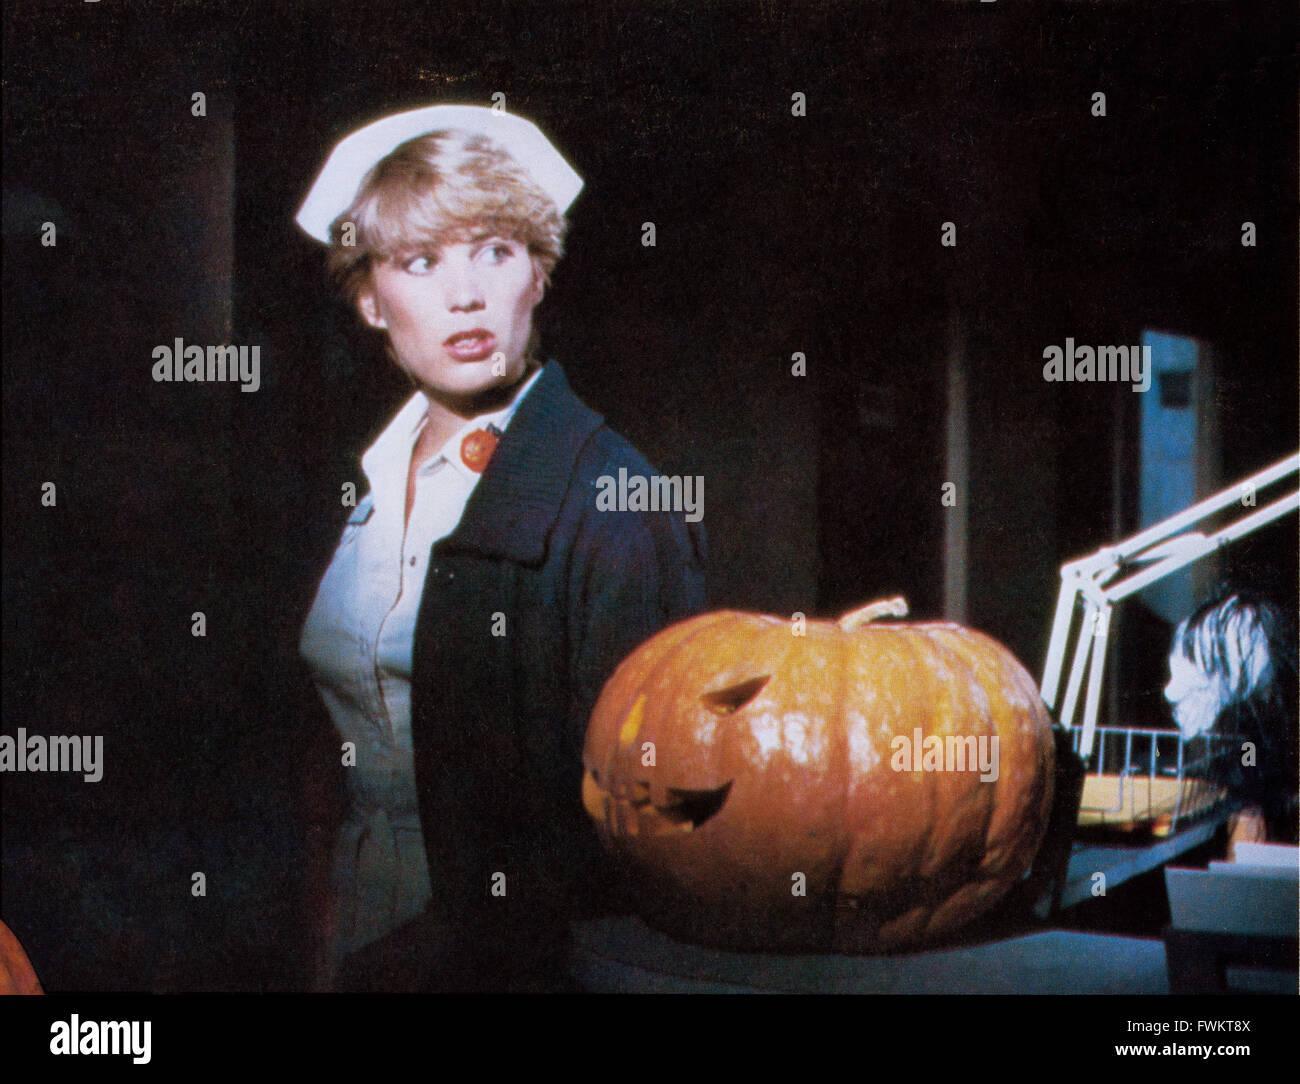 Halloween 2 1981 Stockfotos & Halloween 2 1981 Bilder - Alamy